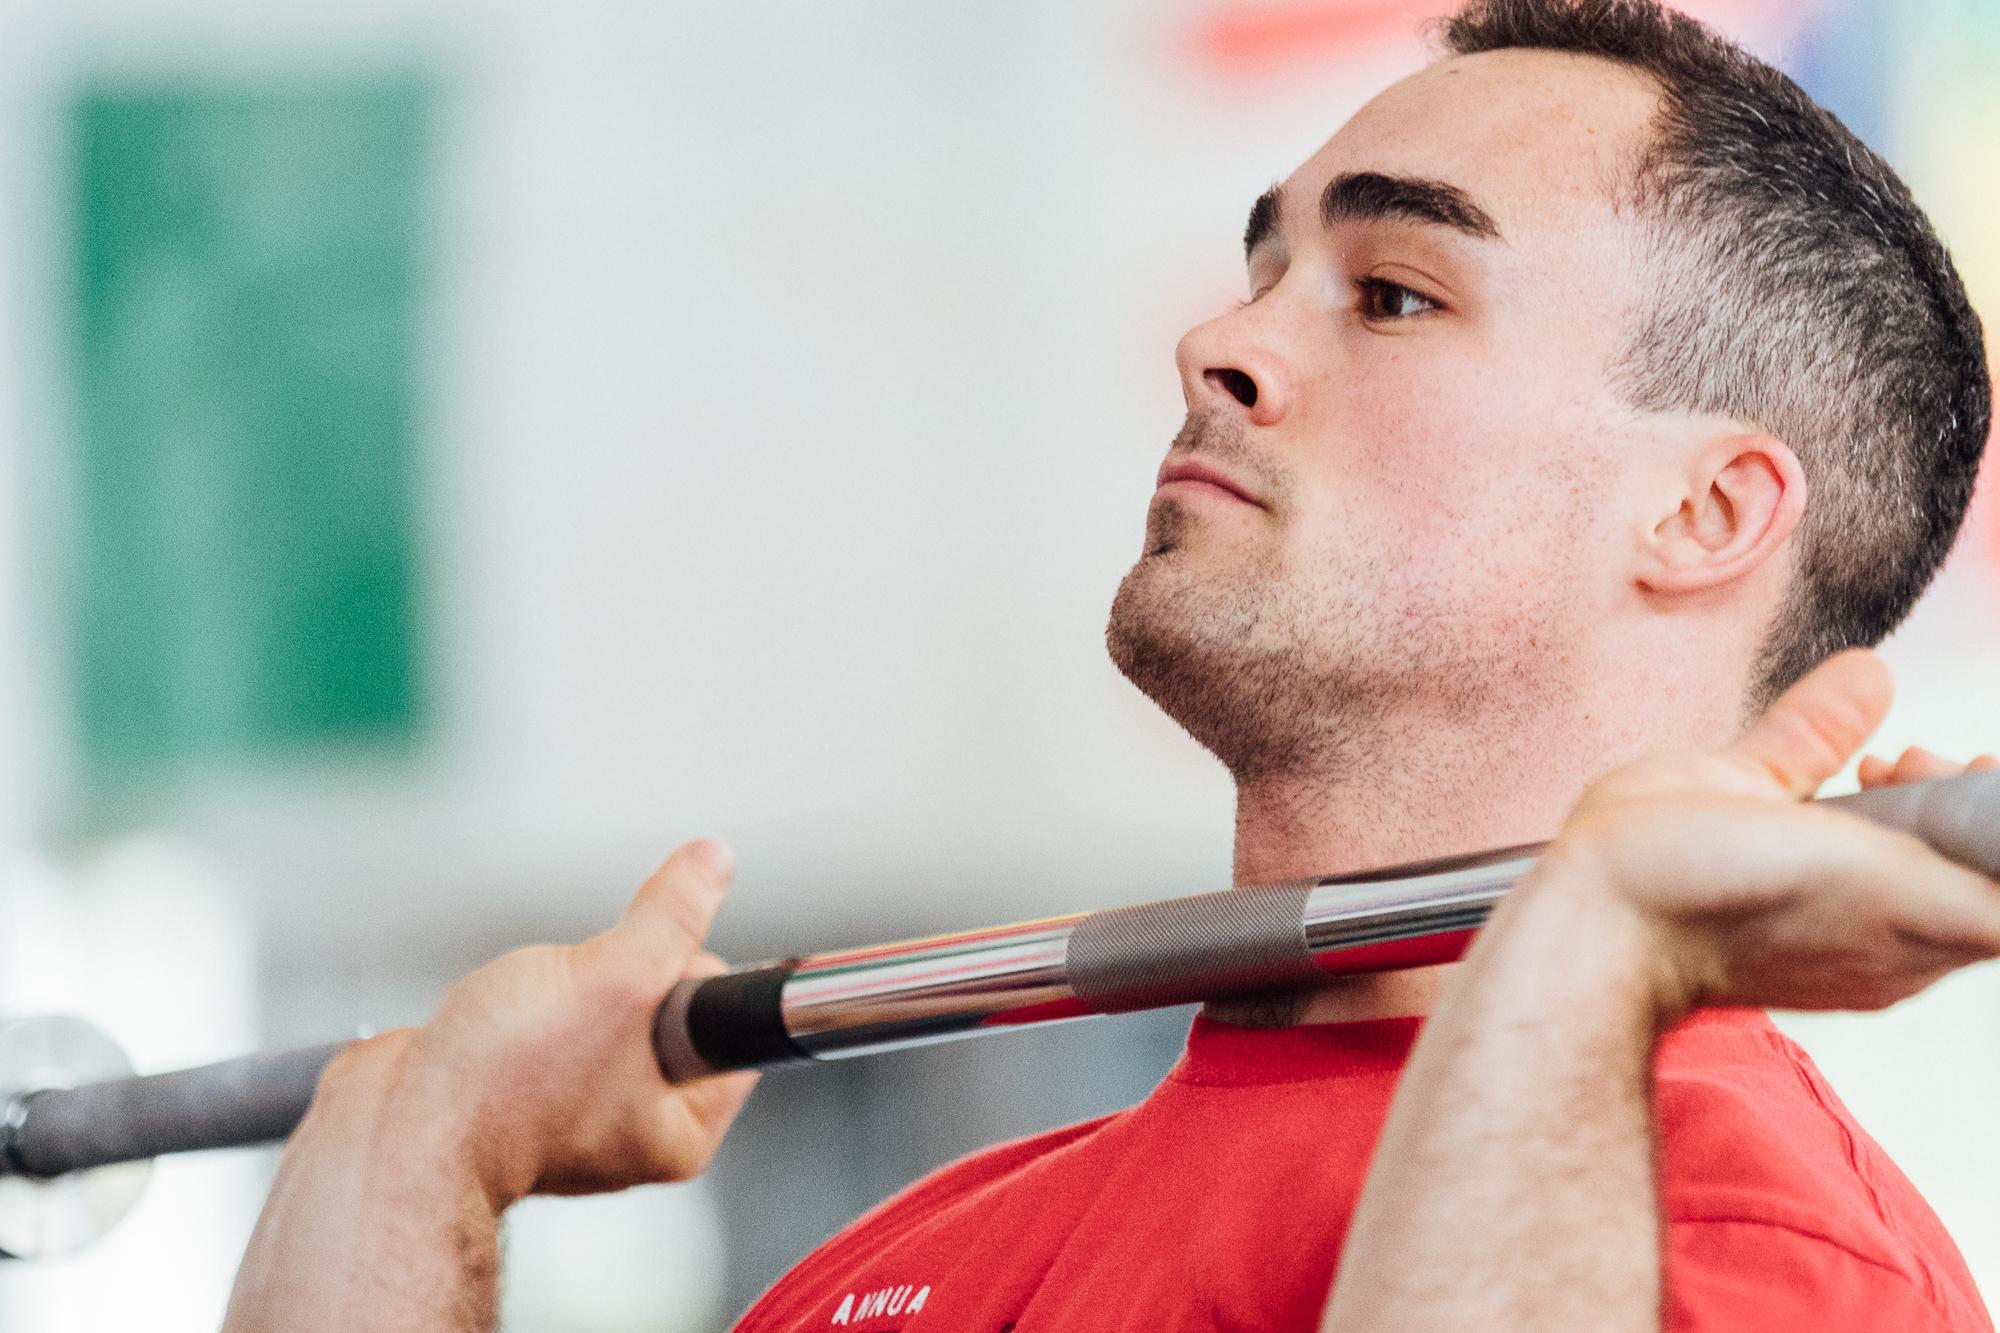 august-nywa-training-weightlifting-photos-by-everyday-lifters-viviana-podhaiski-5.jpg